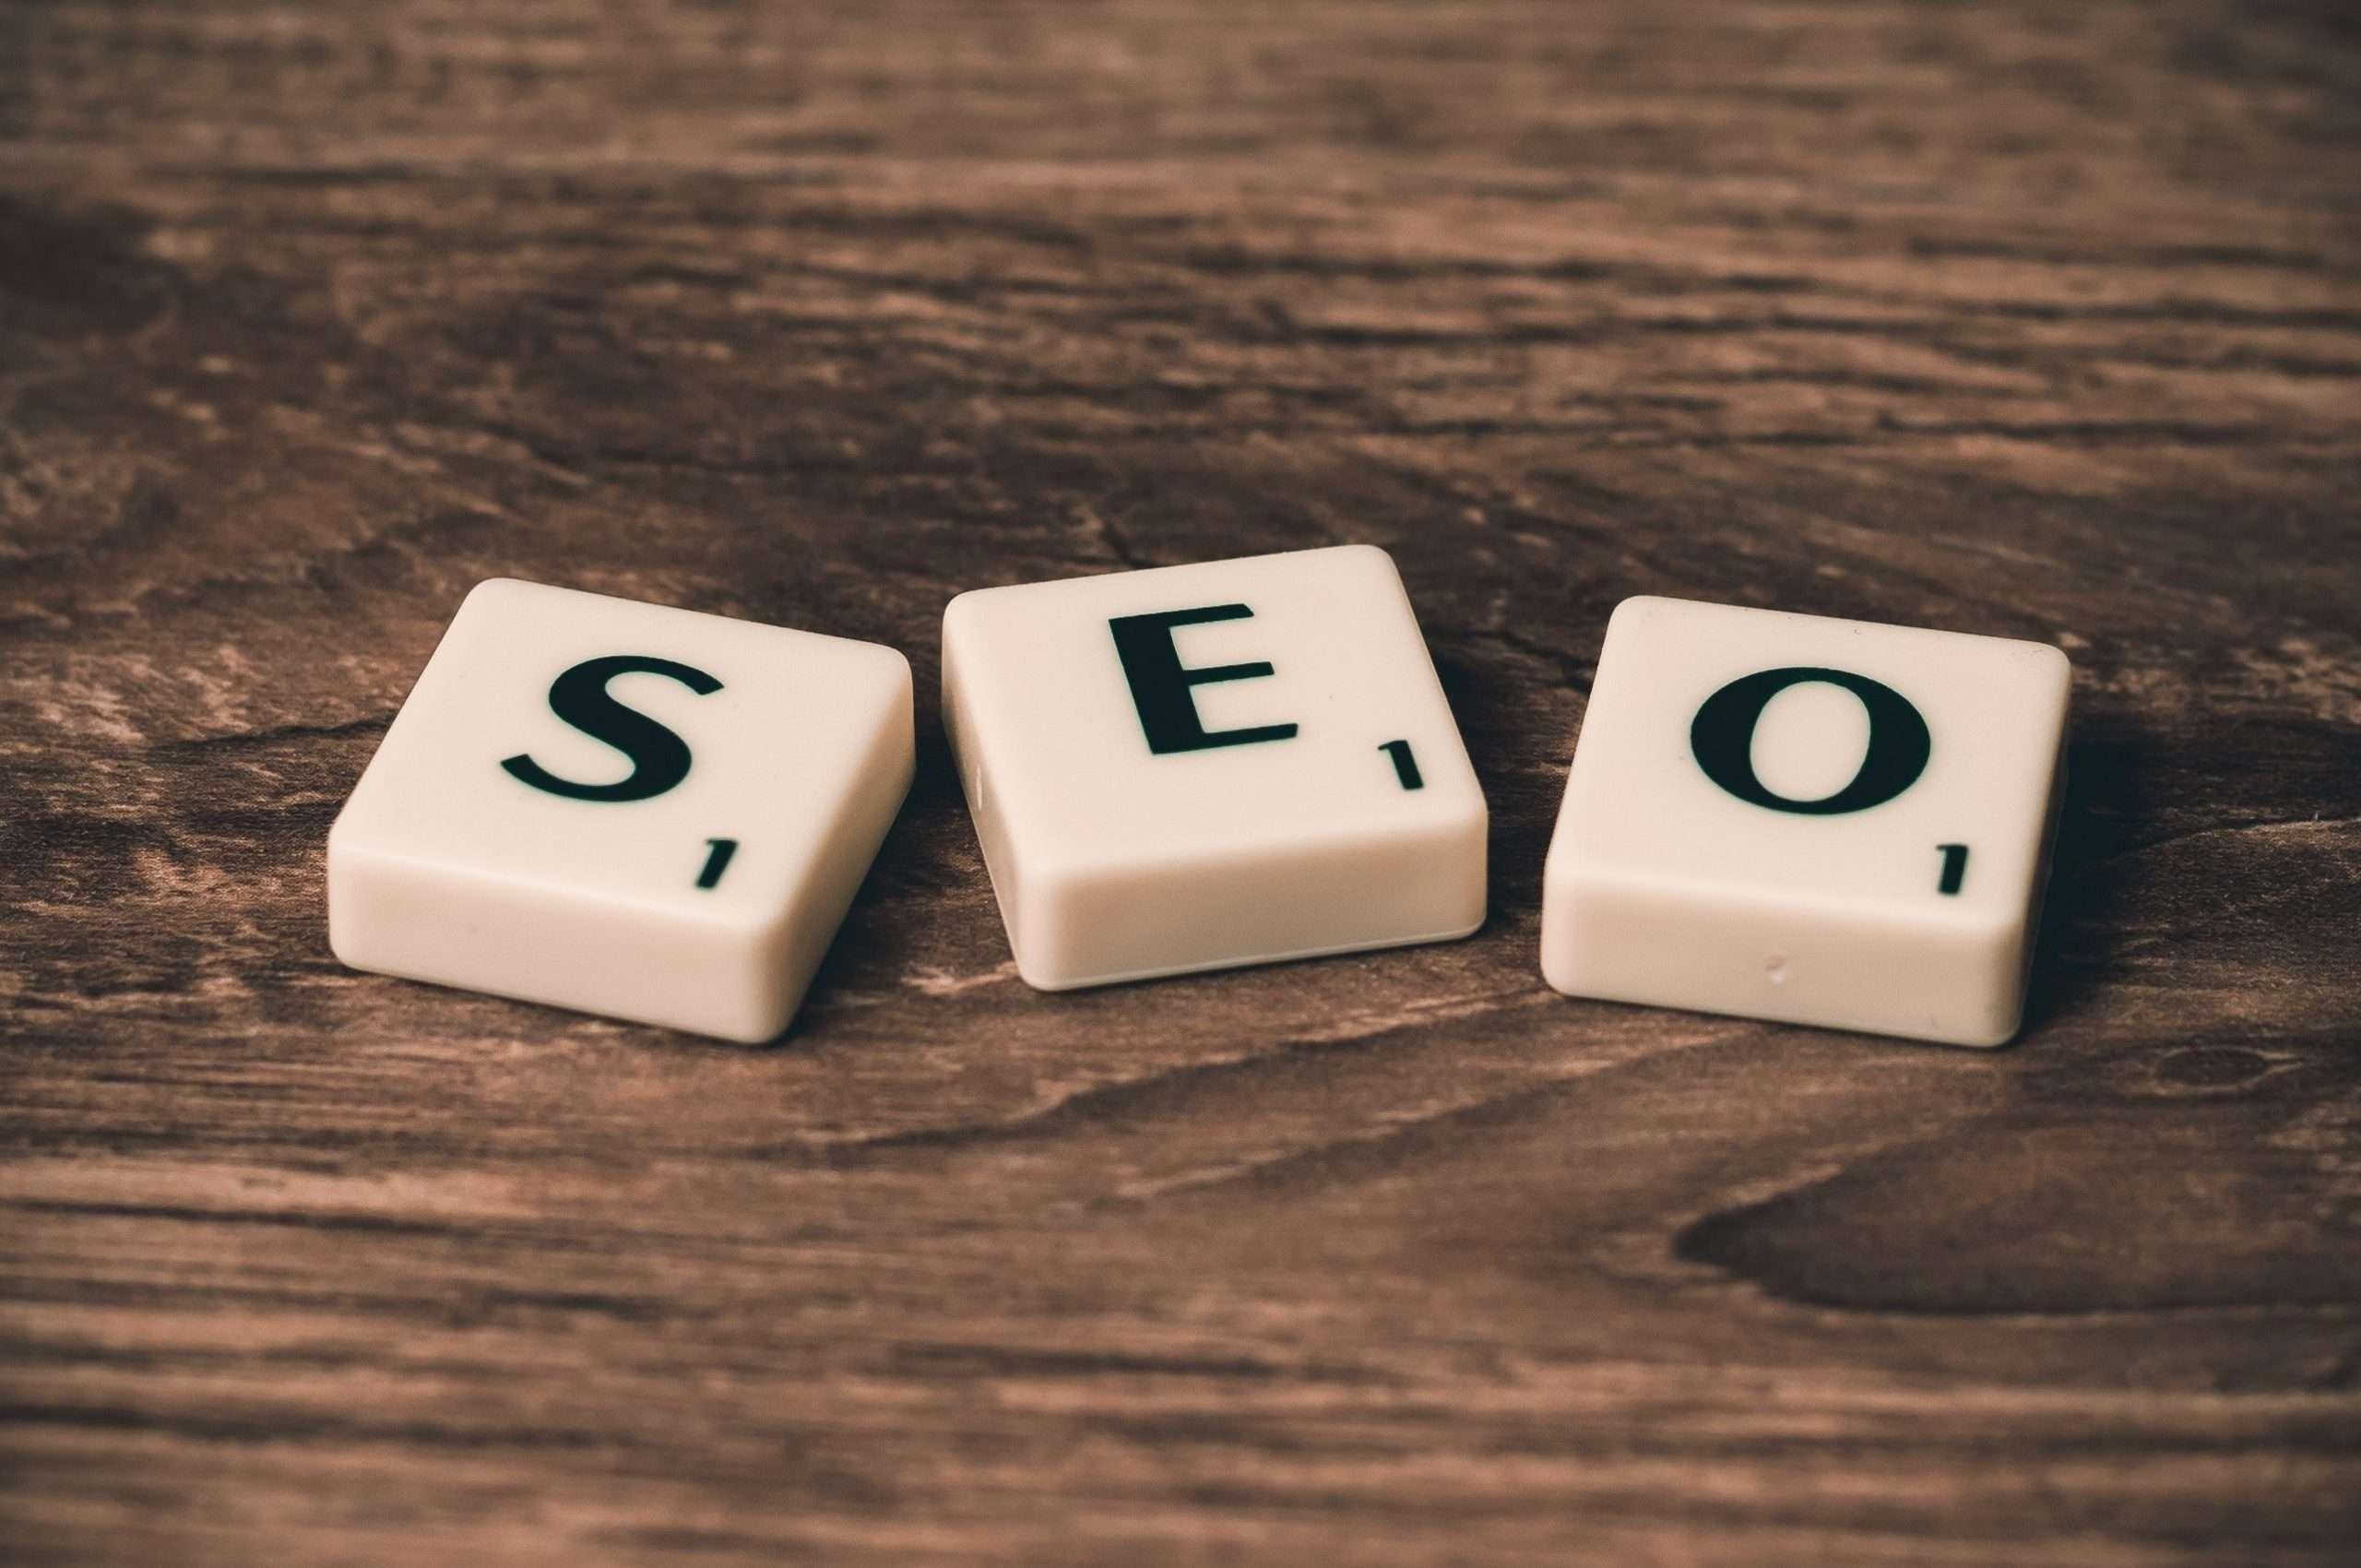 SEO -Search Engine Optimization